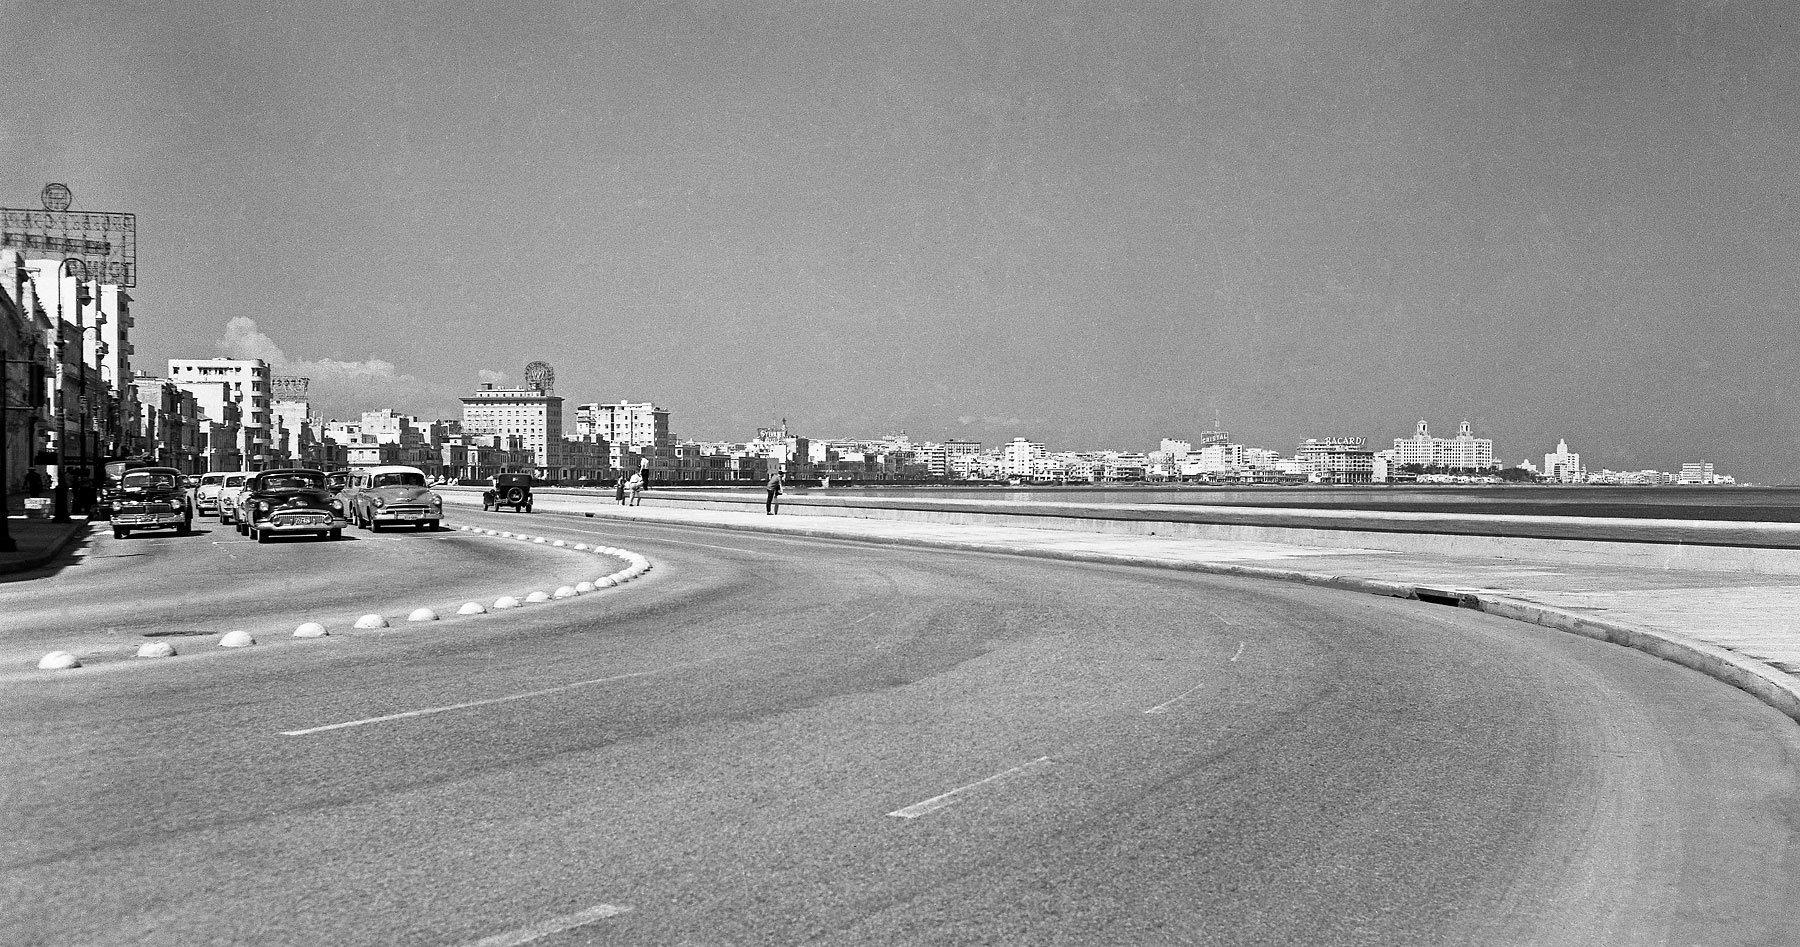 El Malecon, La Habana, c. 1956.